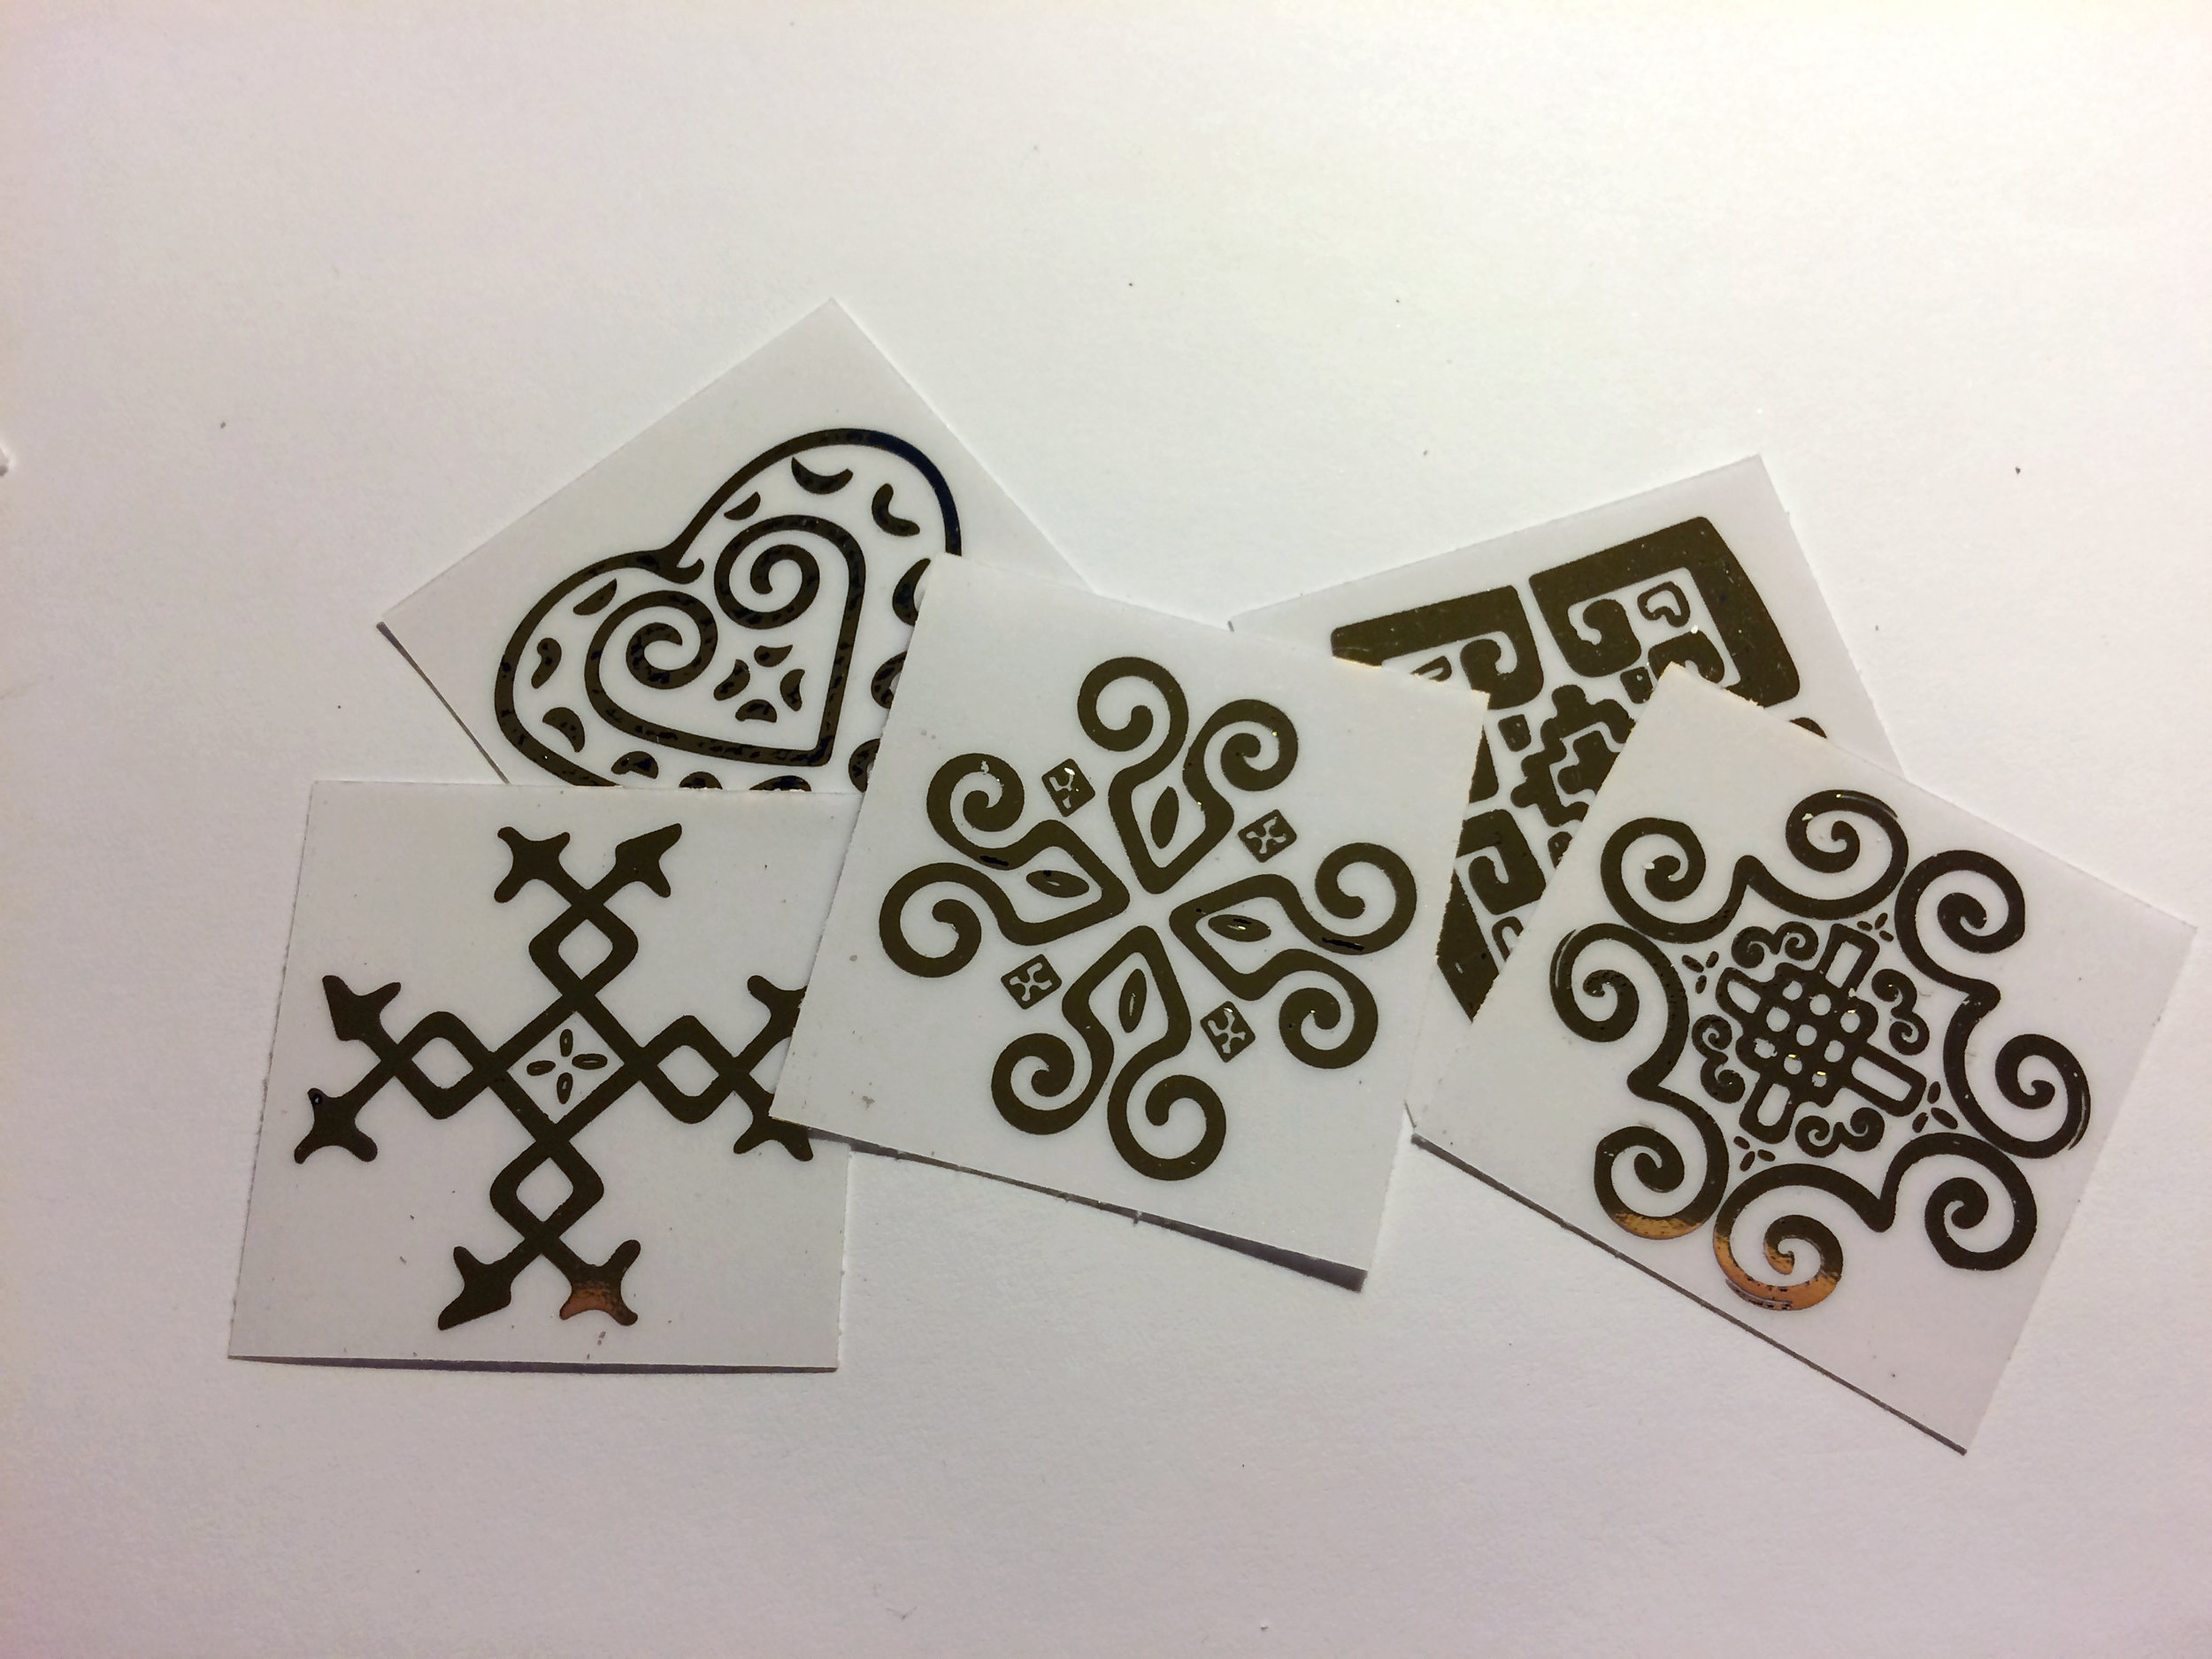 stickers006.jpg